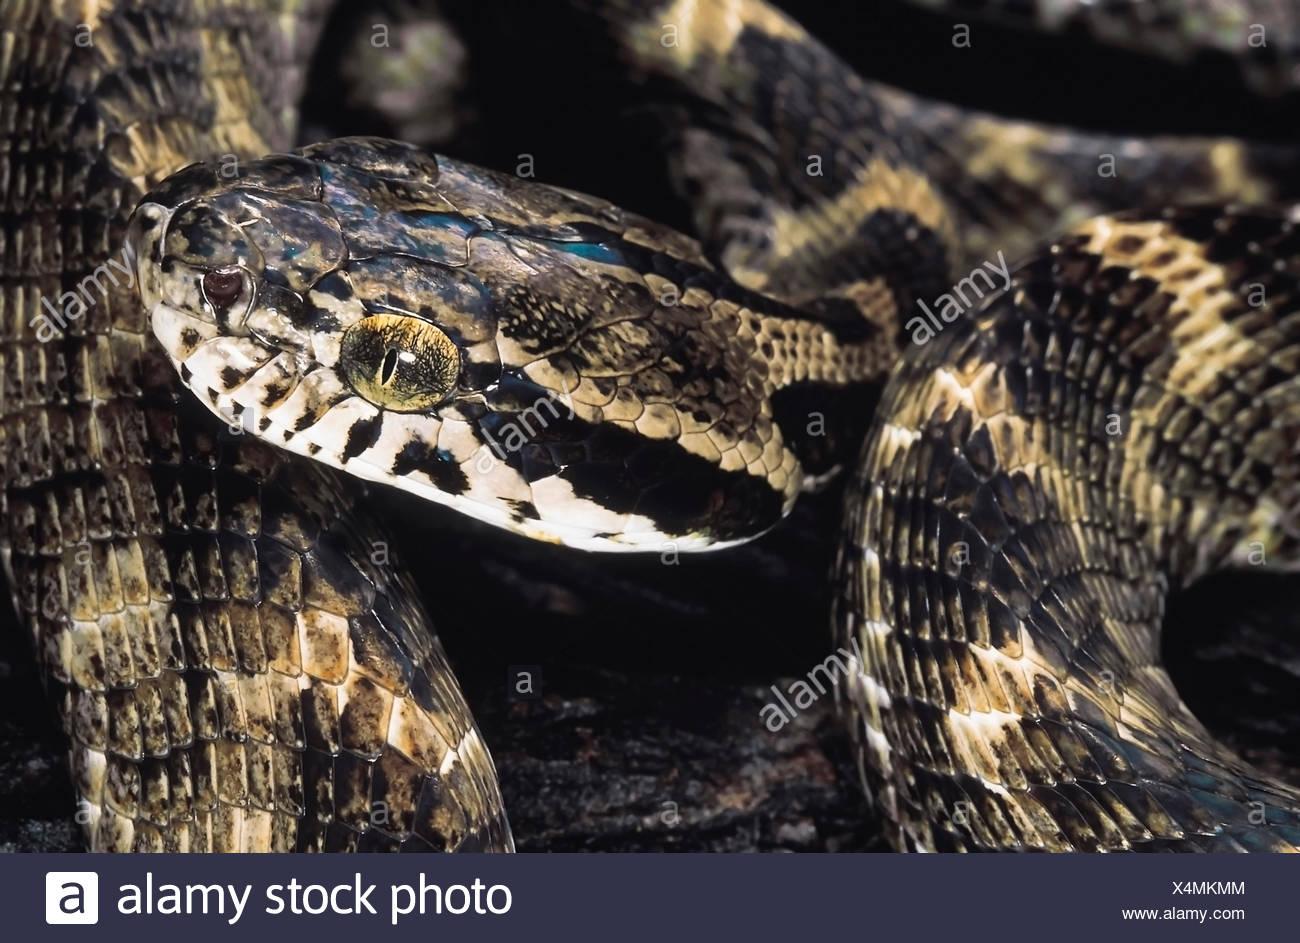 Boiga Forsteni. Forsten's Cat serpiente. No venenosos. En Maharashtra, India. Imagen De Stock